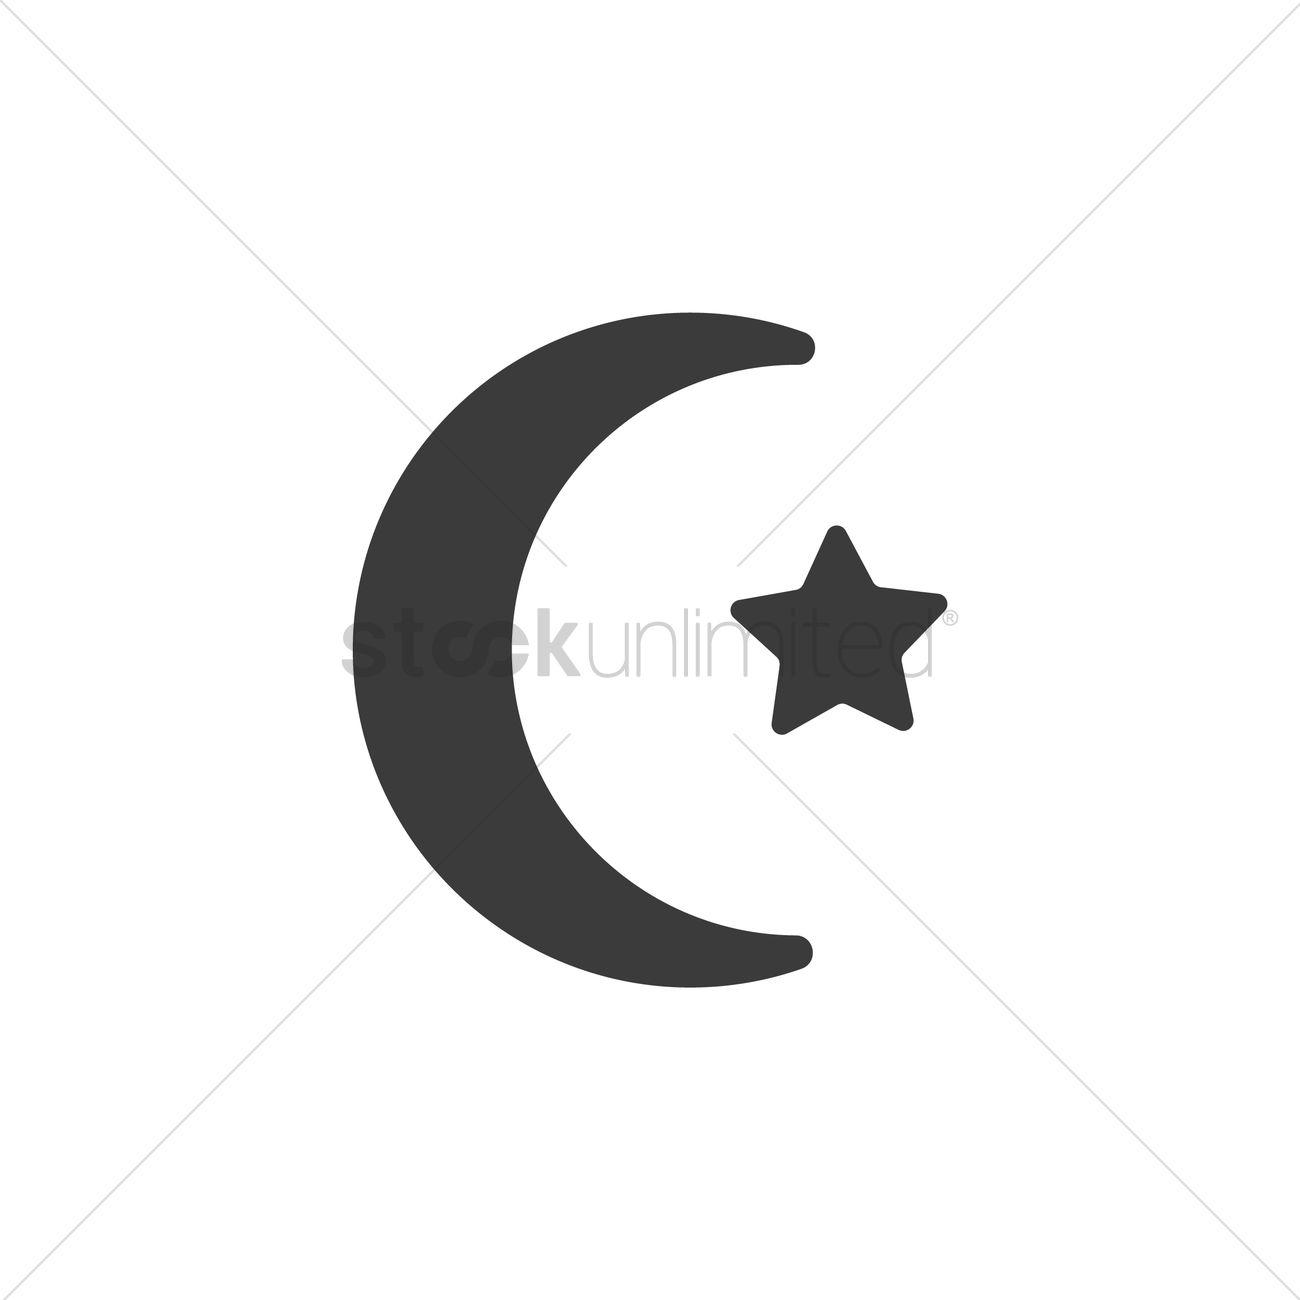 Islamic Symbol Vector Image 2029382 Stockunlimited